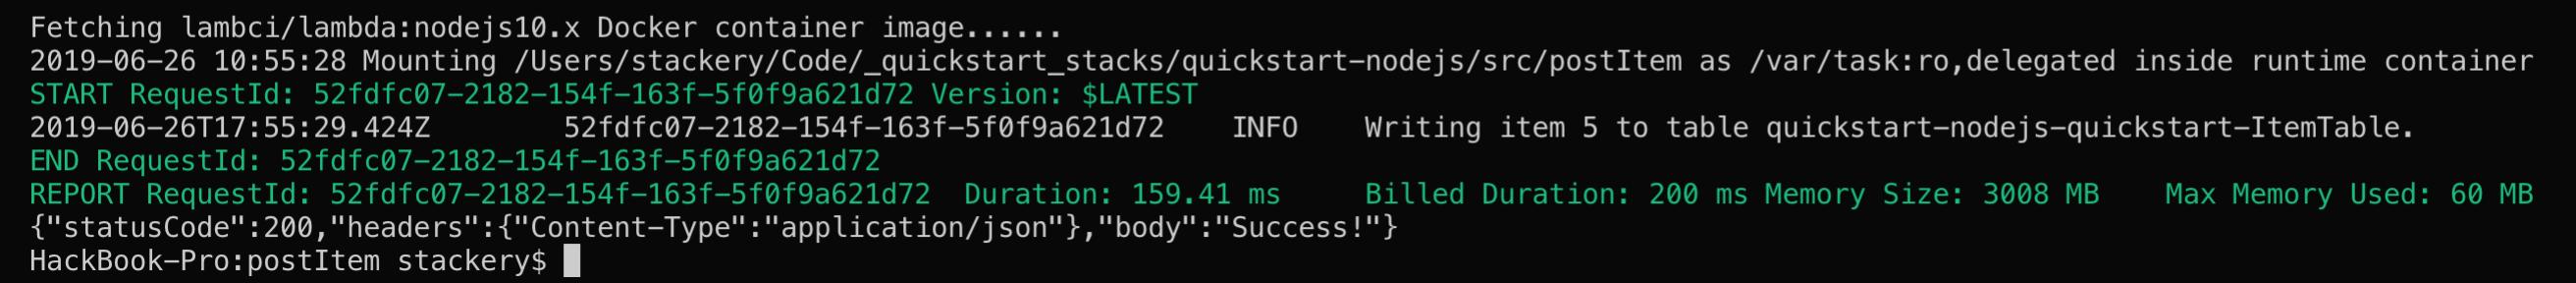 Stackery Quickstart Python · Stackery Documentation